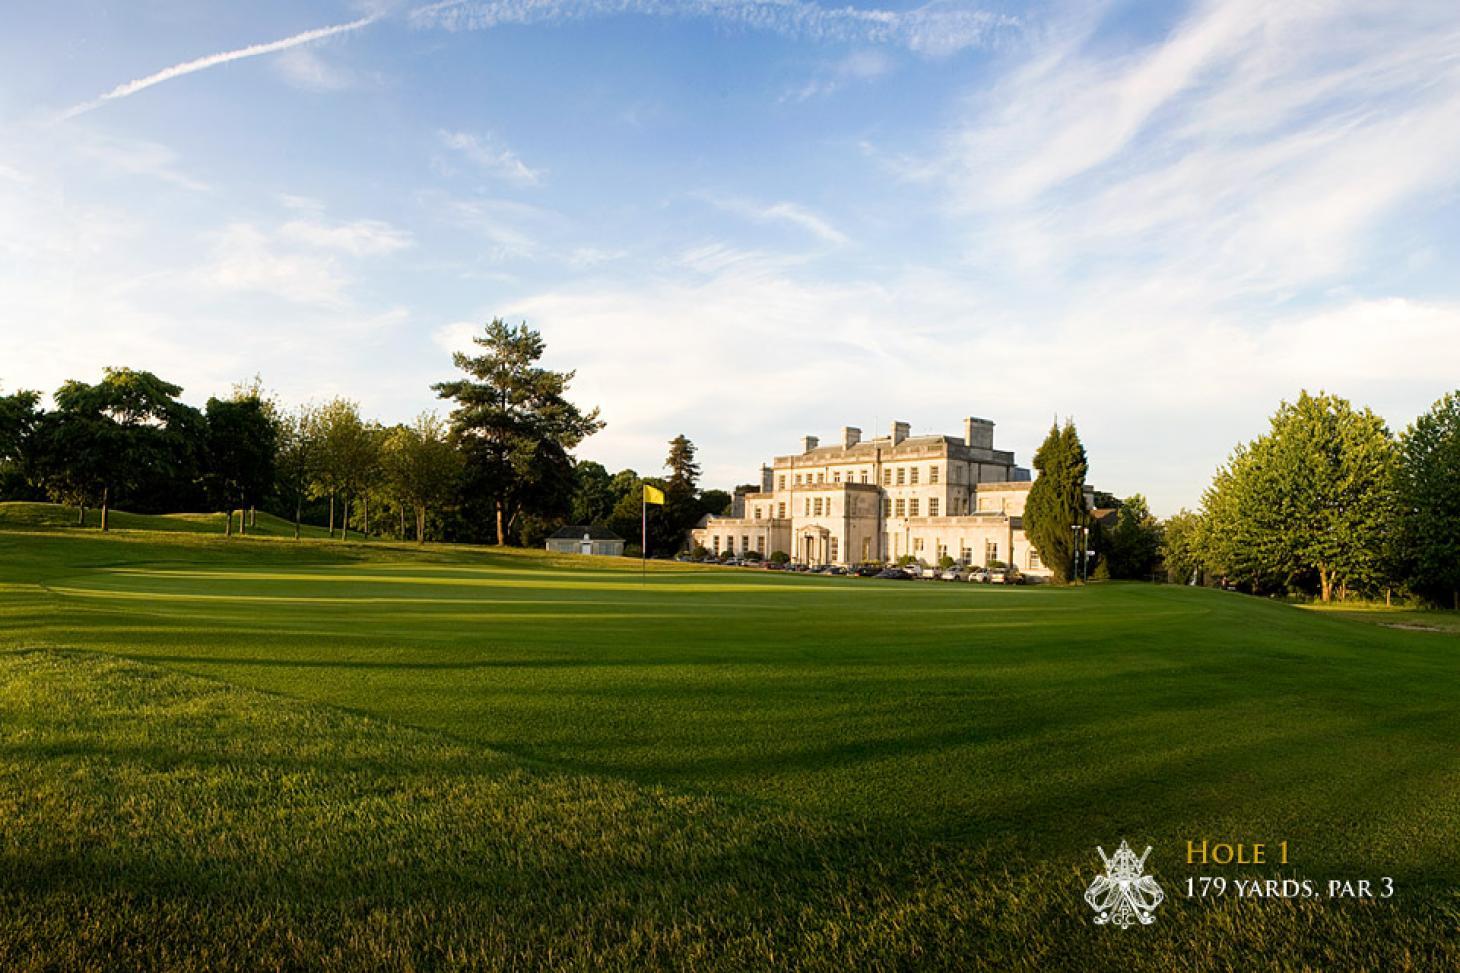 Addington Palace 18 hole golf course